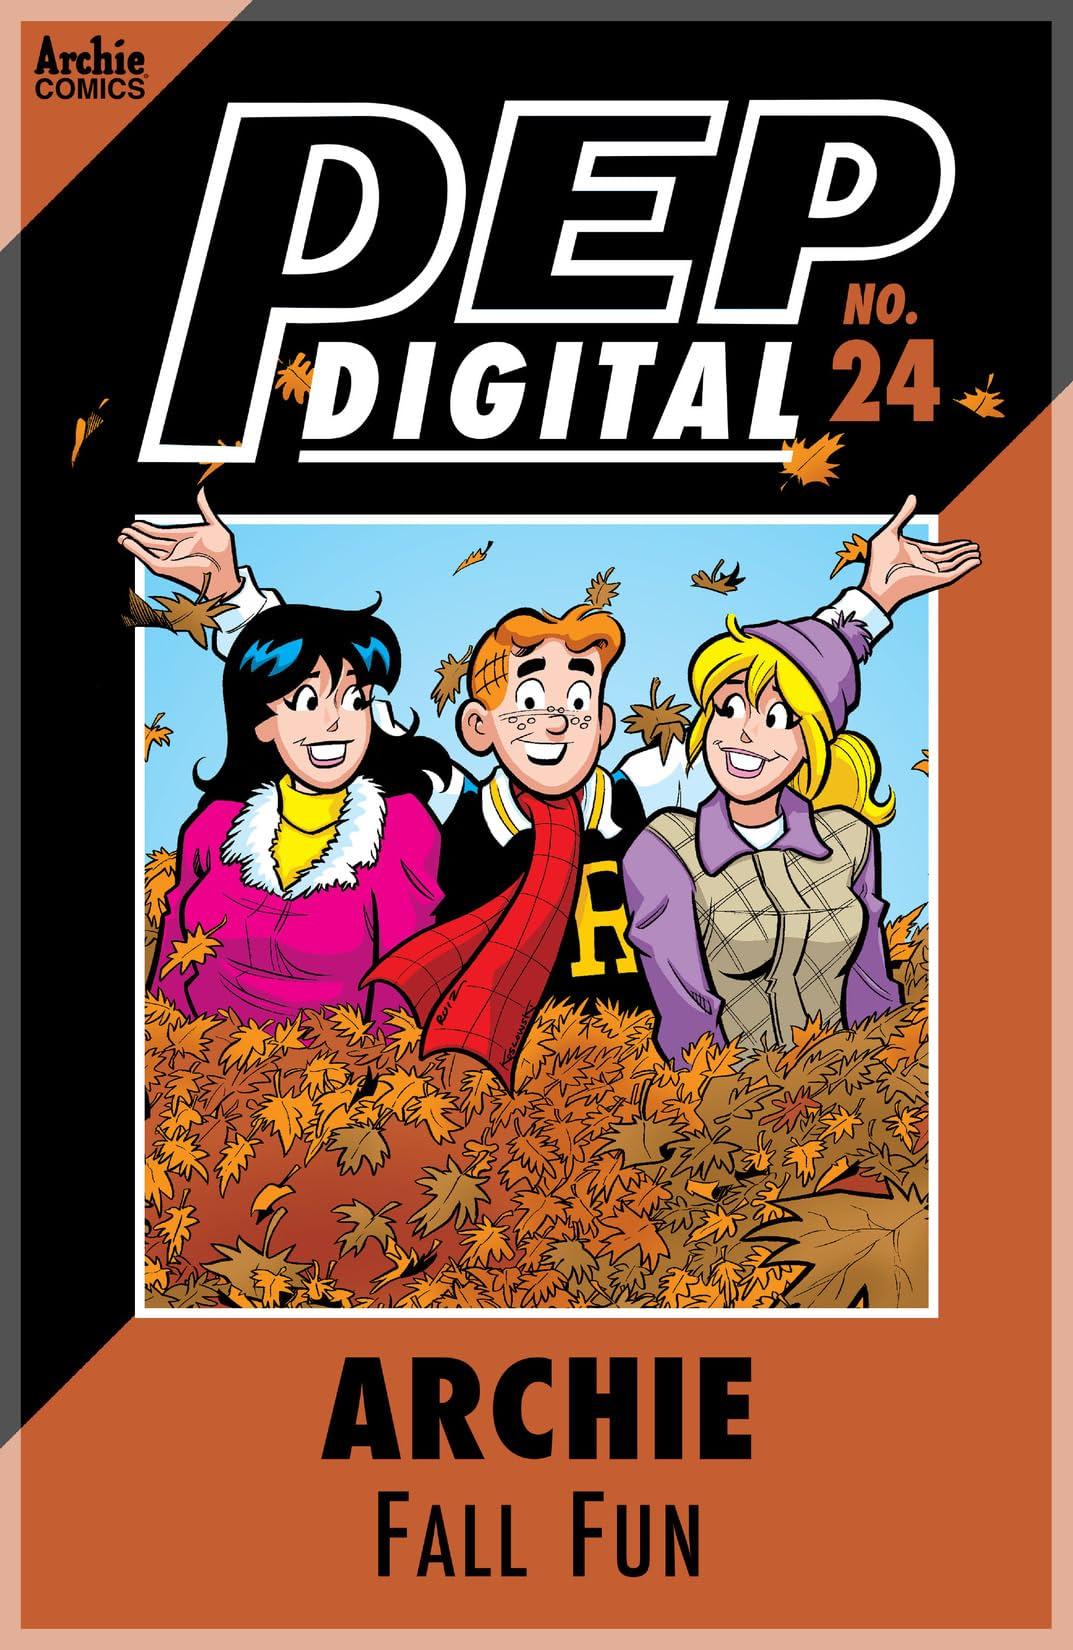 PEP Digital #24: Archie Fall Fun